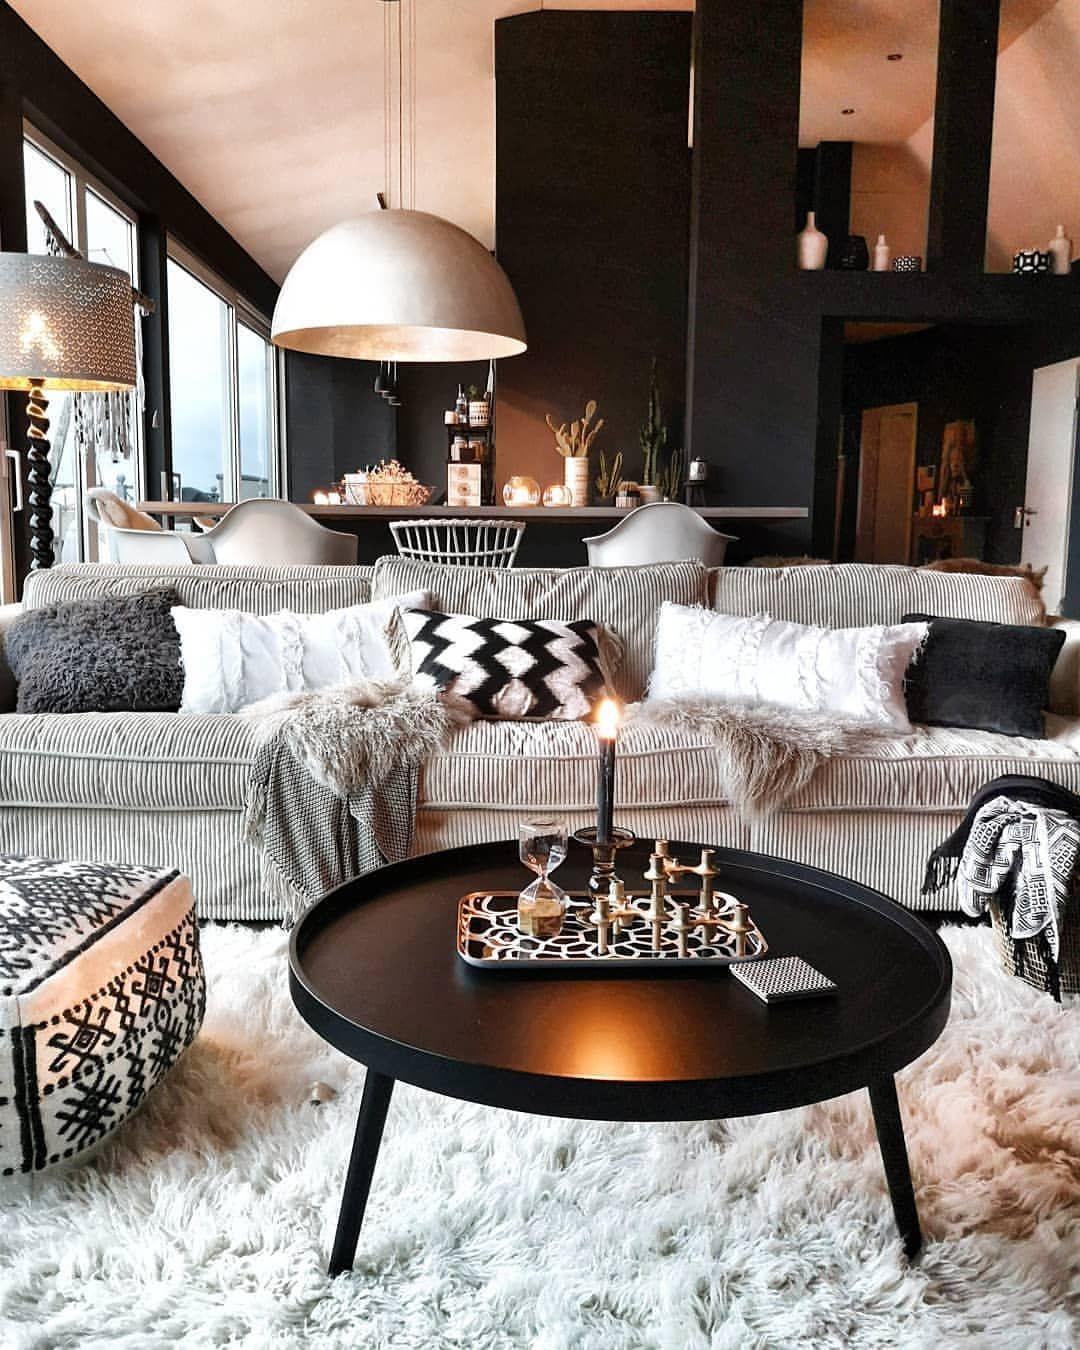 Interior Design Decor On Instagram Cozy Nordic Interior By Belliwood Living Livingroom Livingroomdecor Livi House Interior Interior Interior Design